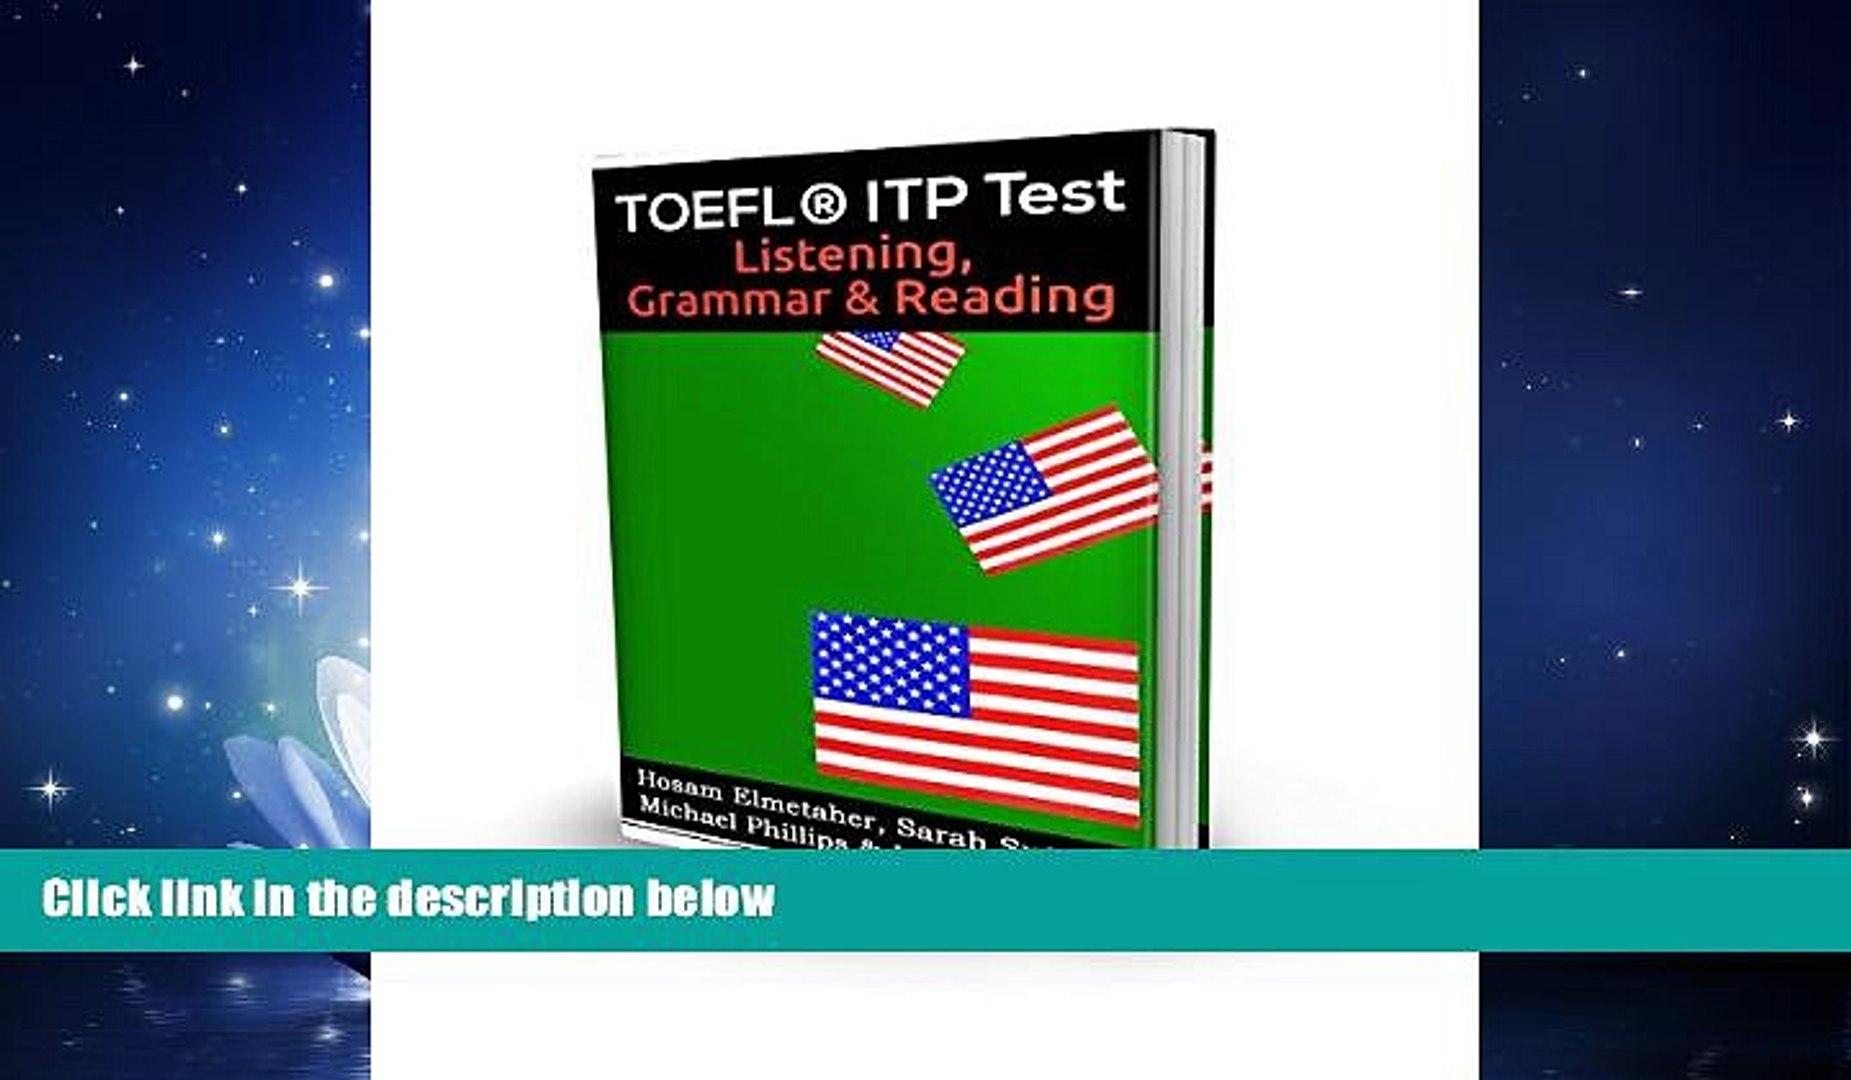 Try These Toefl ® Itp Test Listening Grammar & Reading Pdf